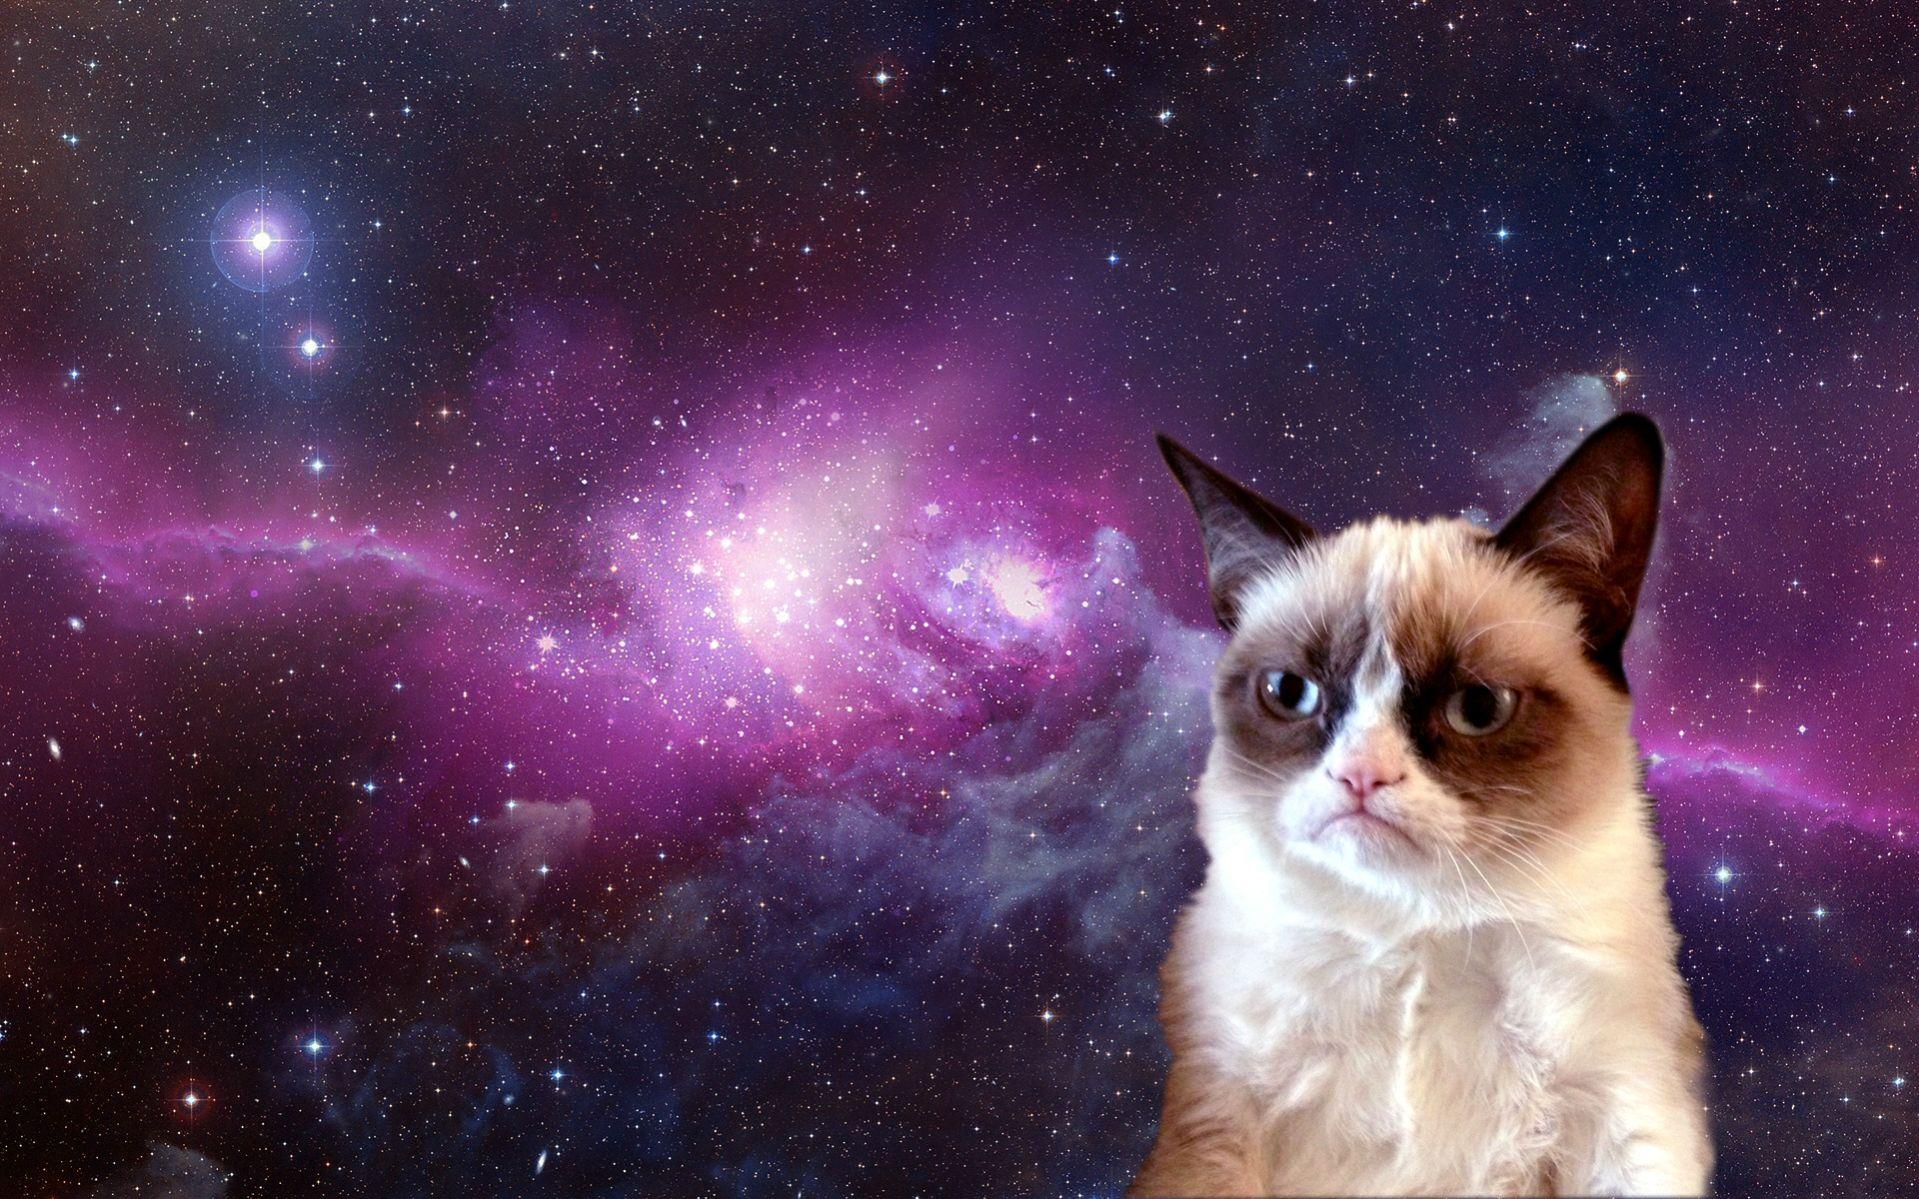 Grumpy Cat on the Car HD Wallpaper for Desktop 1919x1199